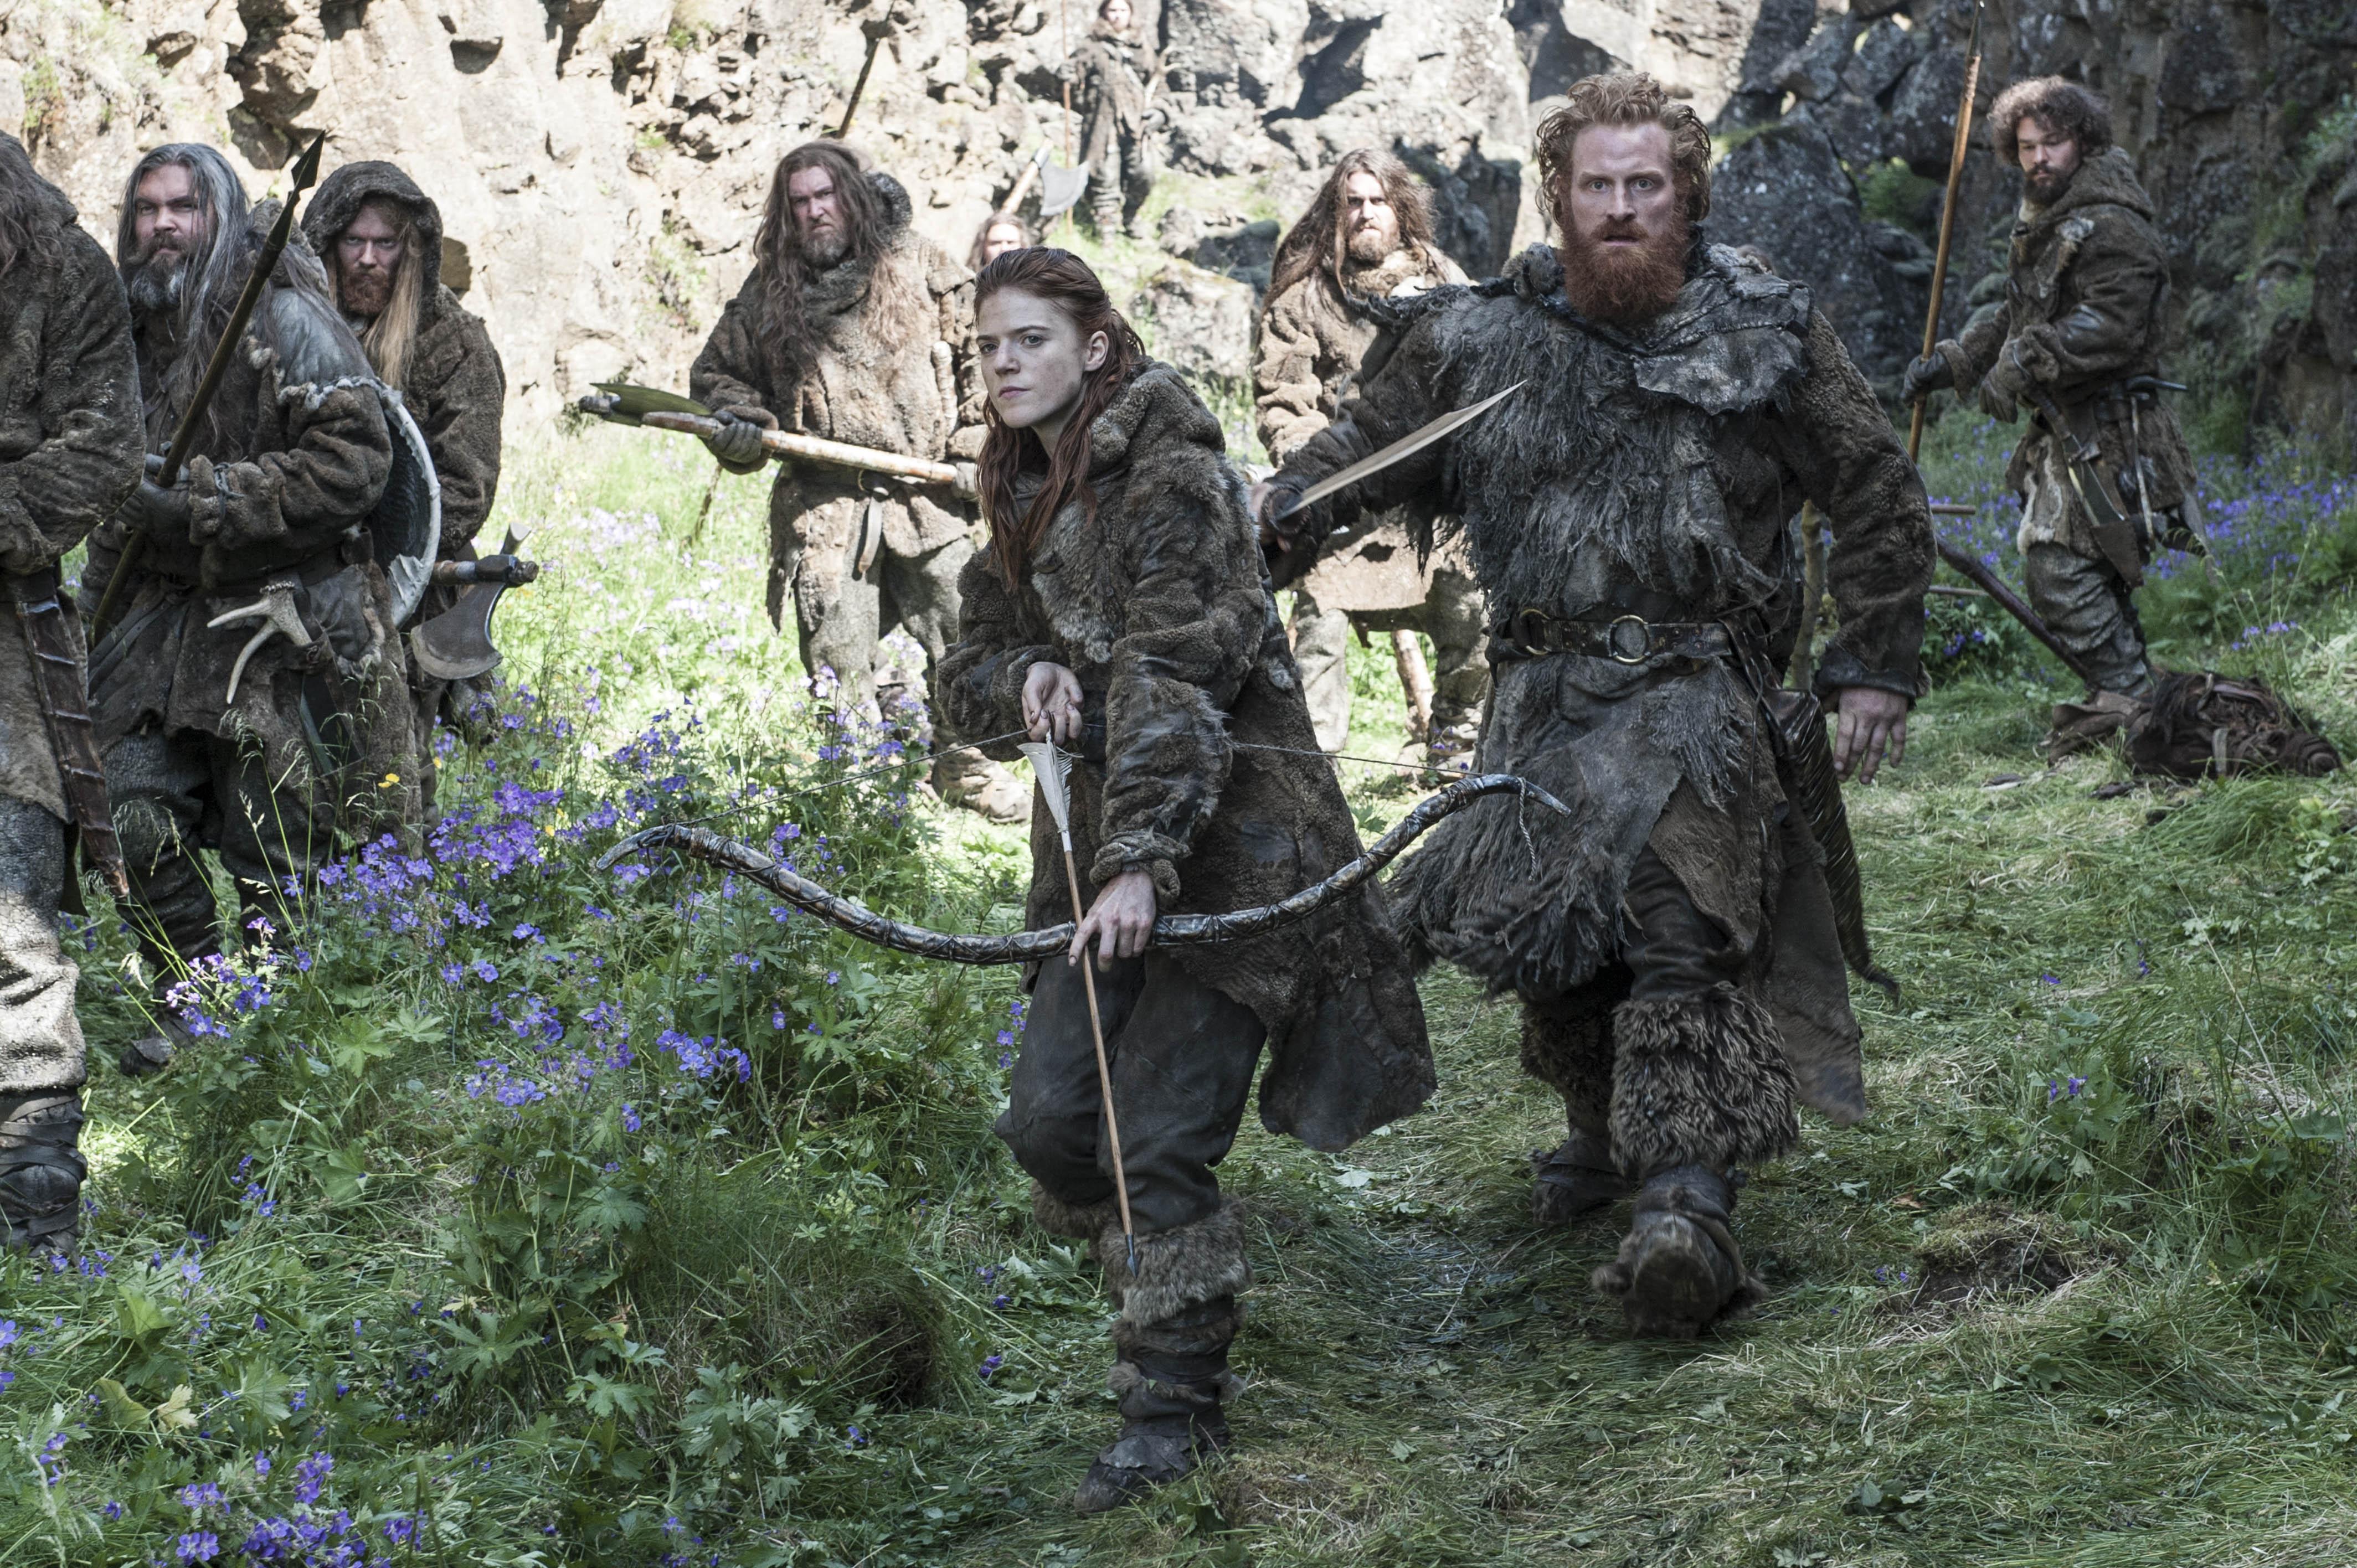 Season-4-Episode-1-Two-Swords-game-of-thrones-36908376-4256-2832.jpg